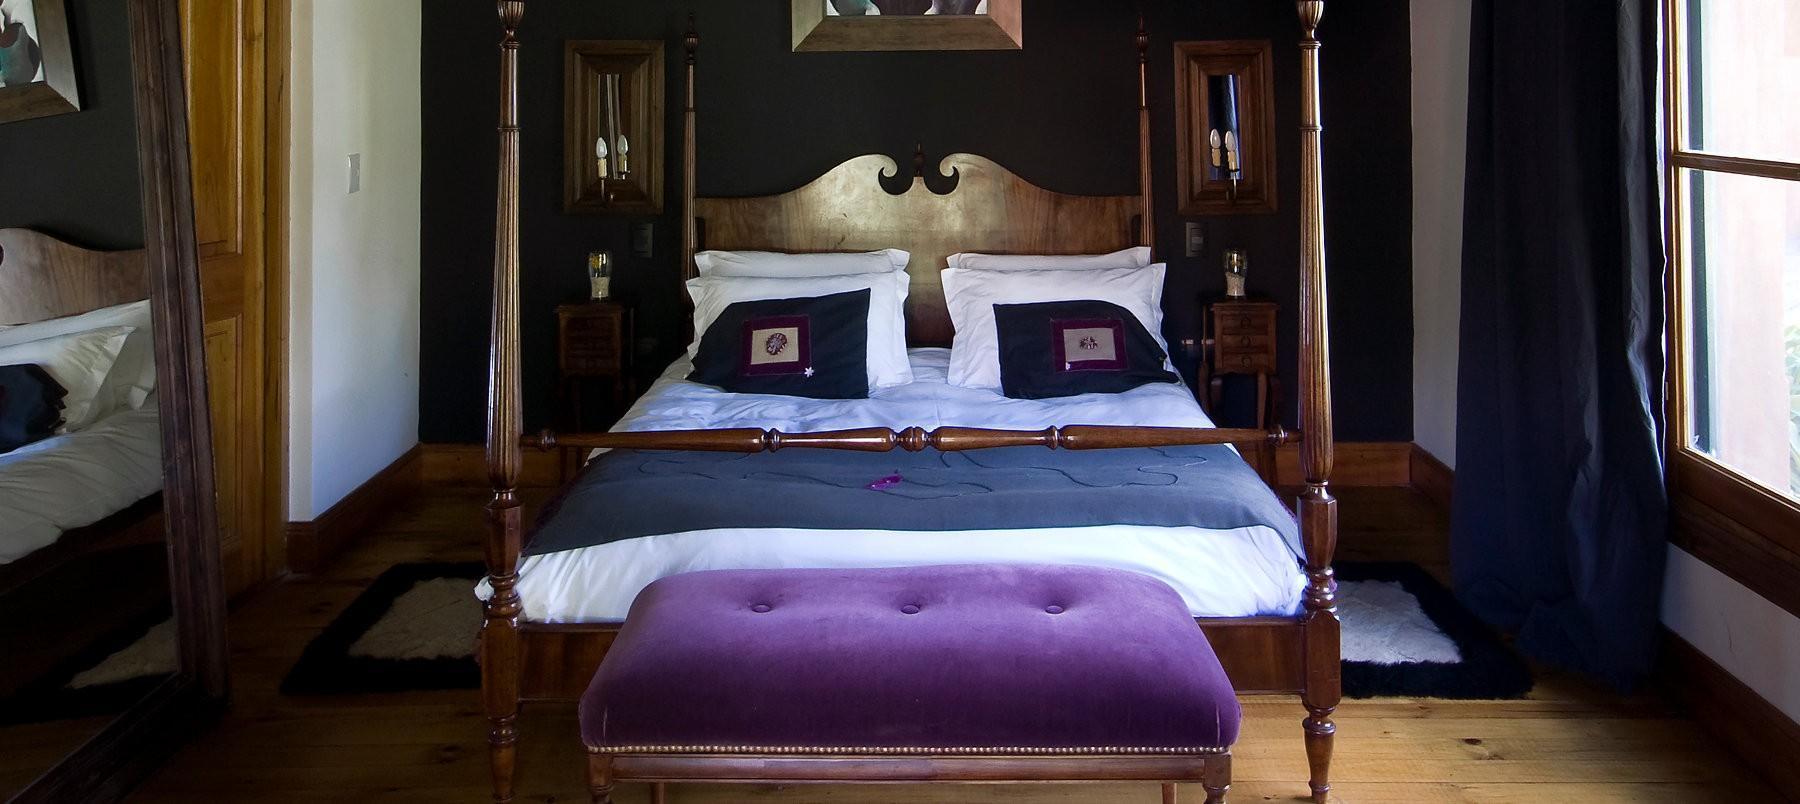 puesto-viejo-estancia-argentina_carousel_accommodations-2_hotel-room-accommodation-1800x804.jpg